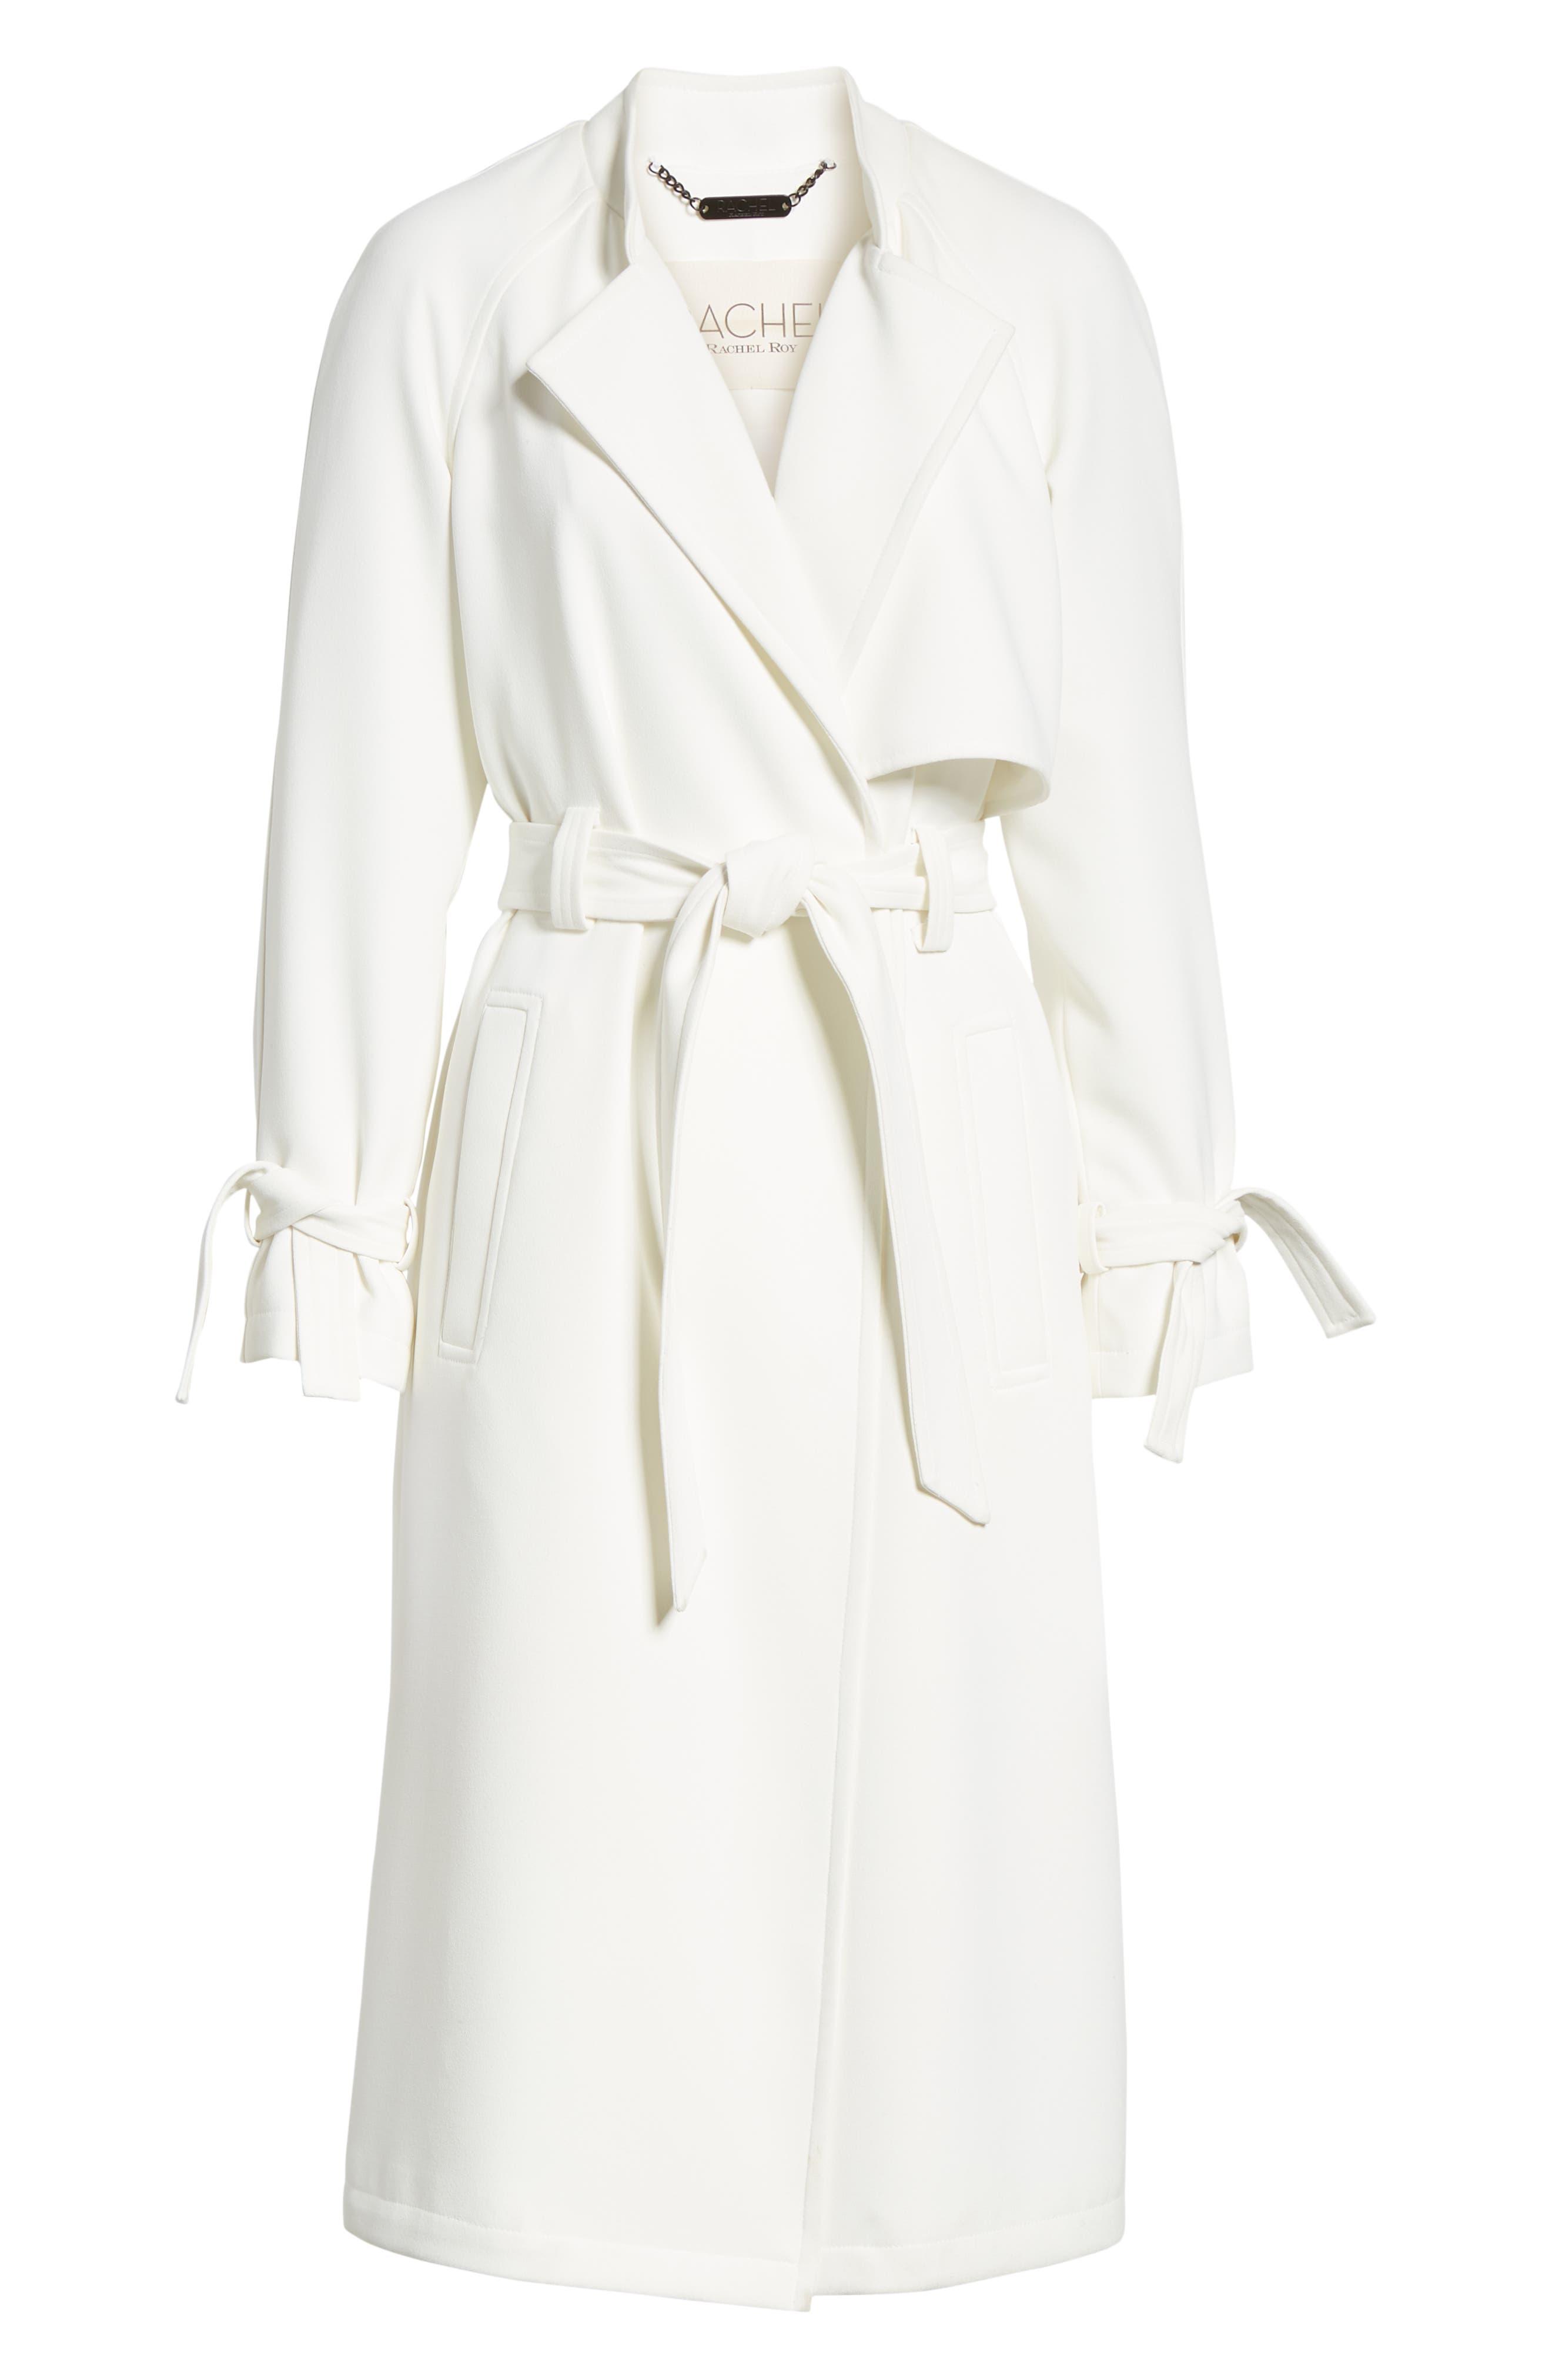 RACHEL RACHEL ROY, Luxe Crepe Trench Coat, Alternate thumbnail 5, color, WHITE